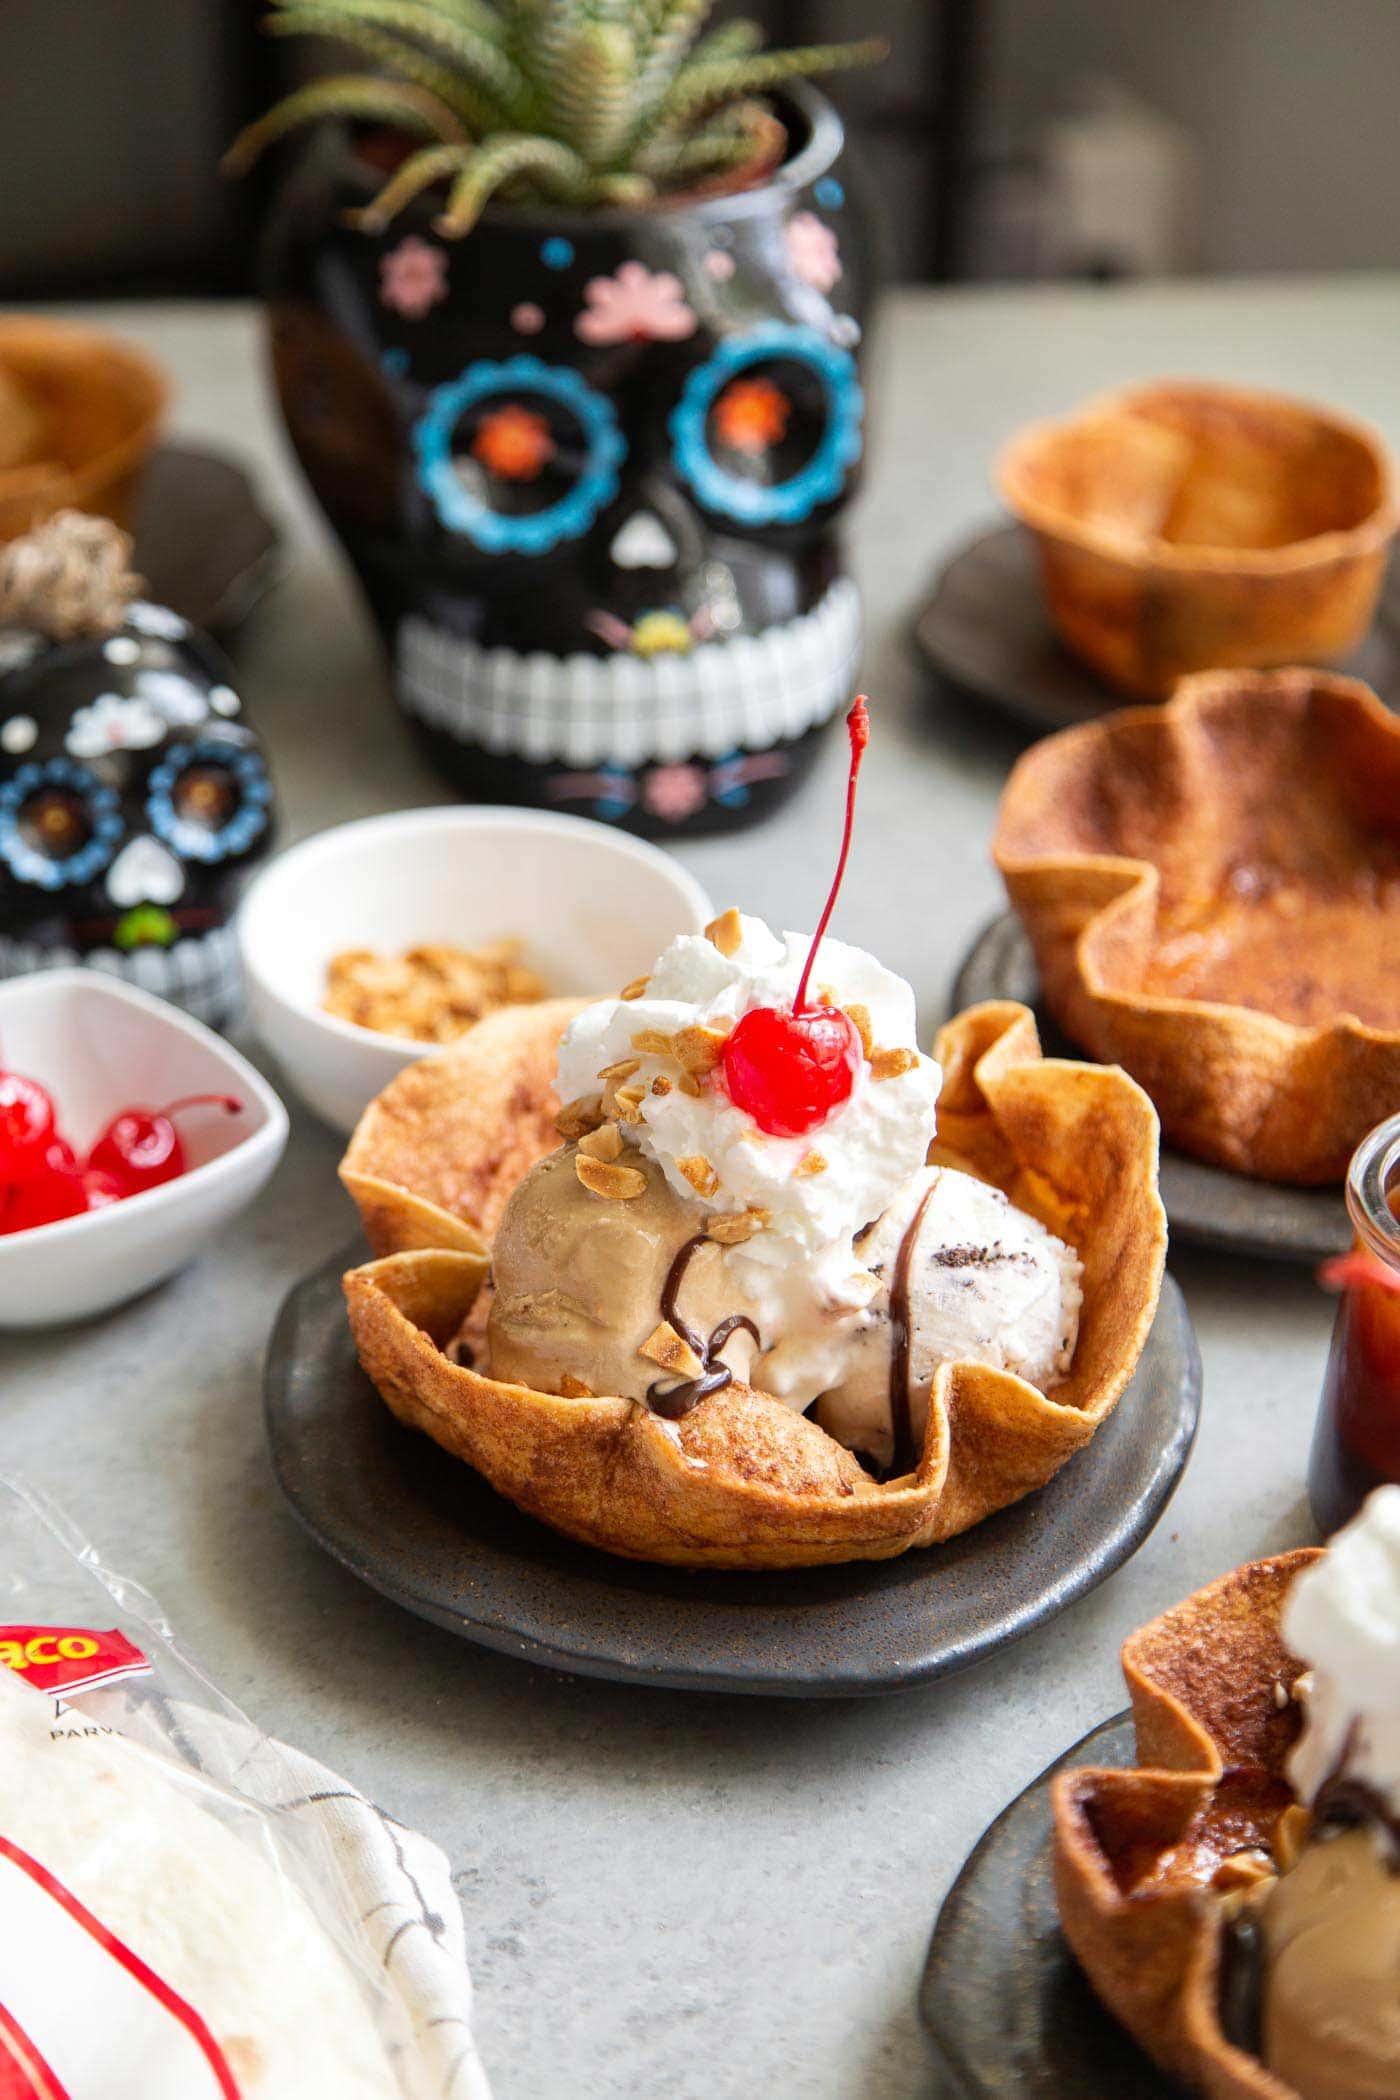 Cinnamon Sugar Tortilla Bowl for Ice Cream Sundae